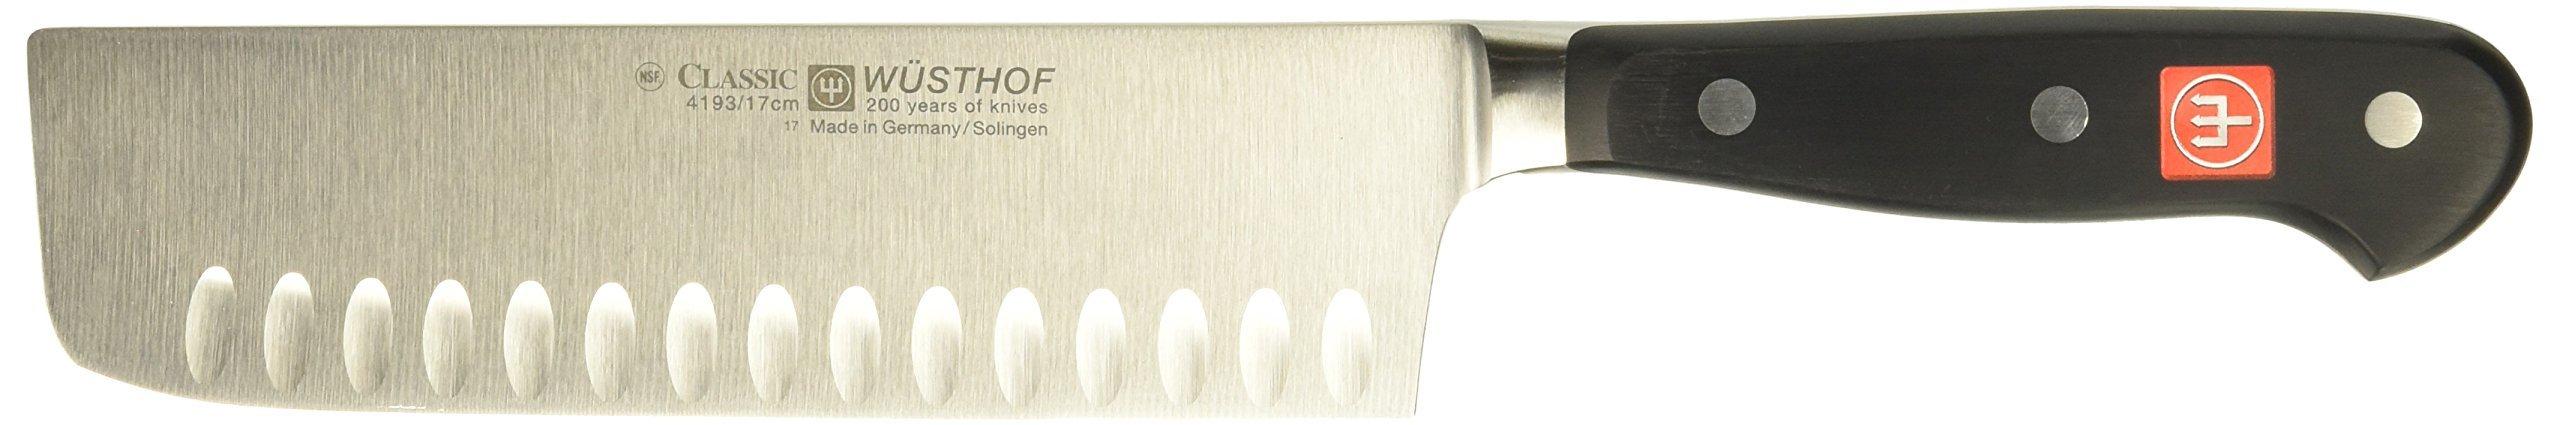 Wusthof Classic 7-Inch Nakiri Knife with Hollow Edge, 4193/17